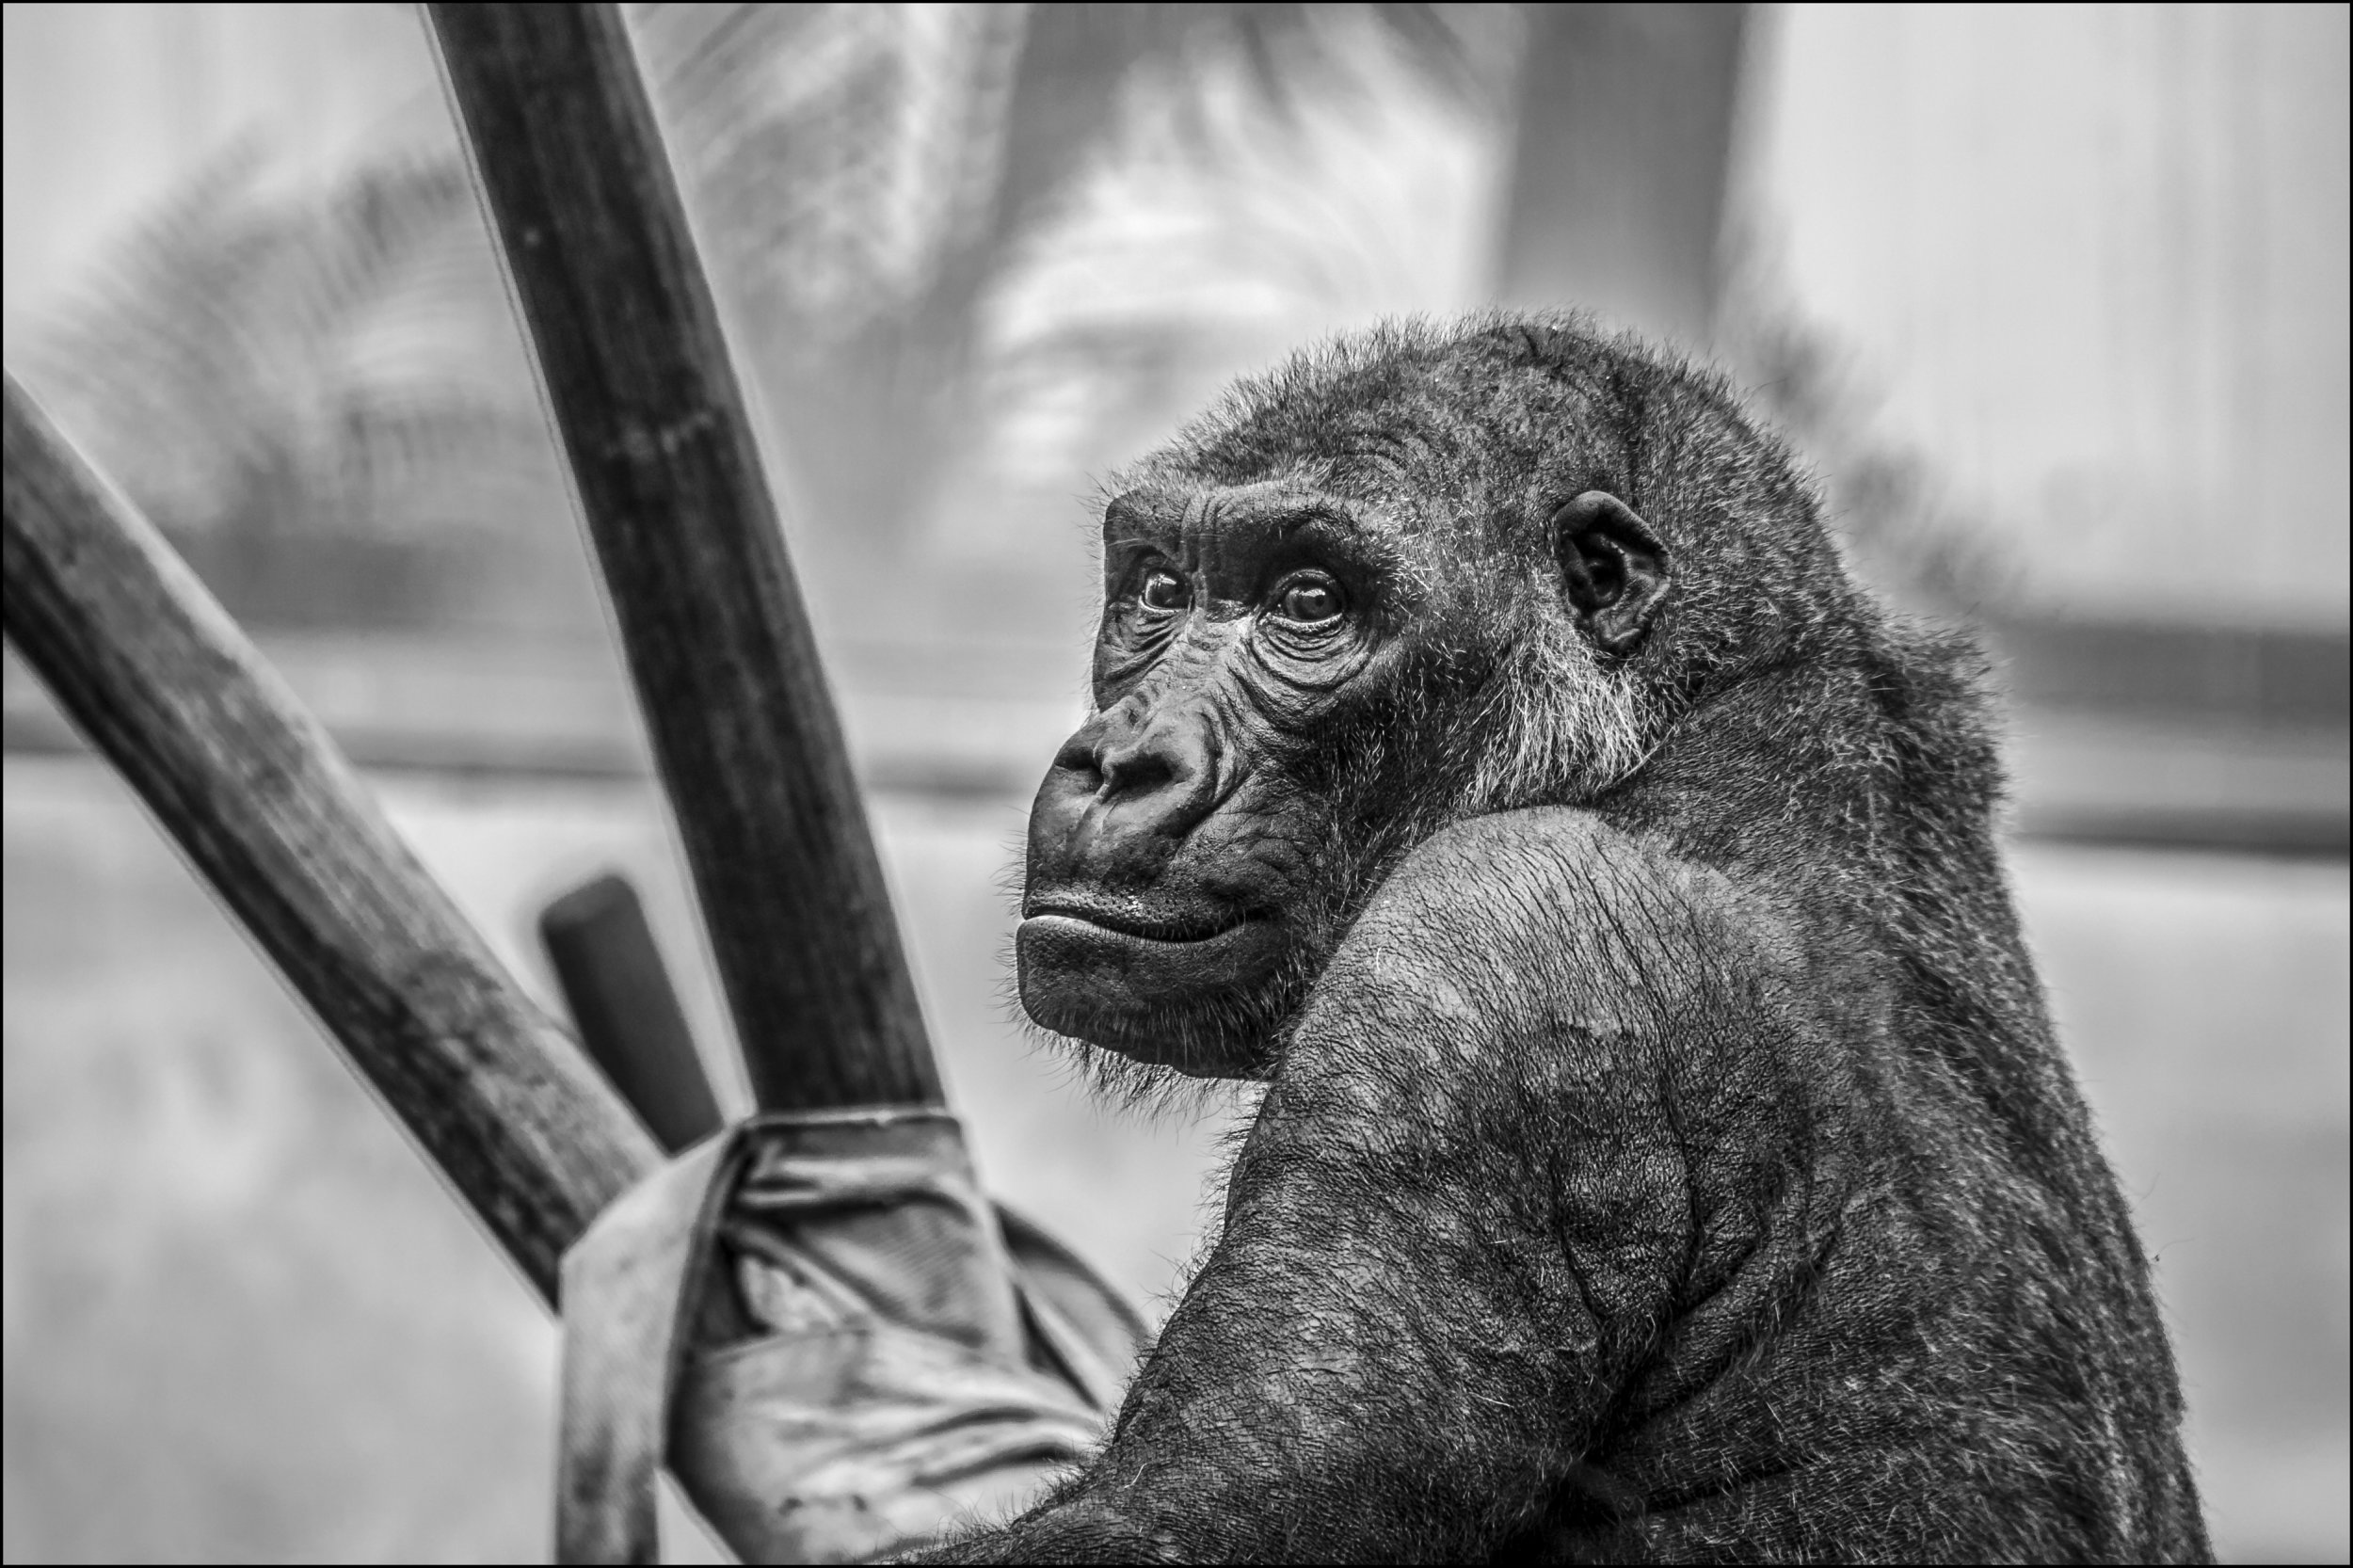 gorilla-zoo-monkey-mammal-37548.jpg